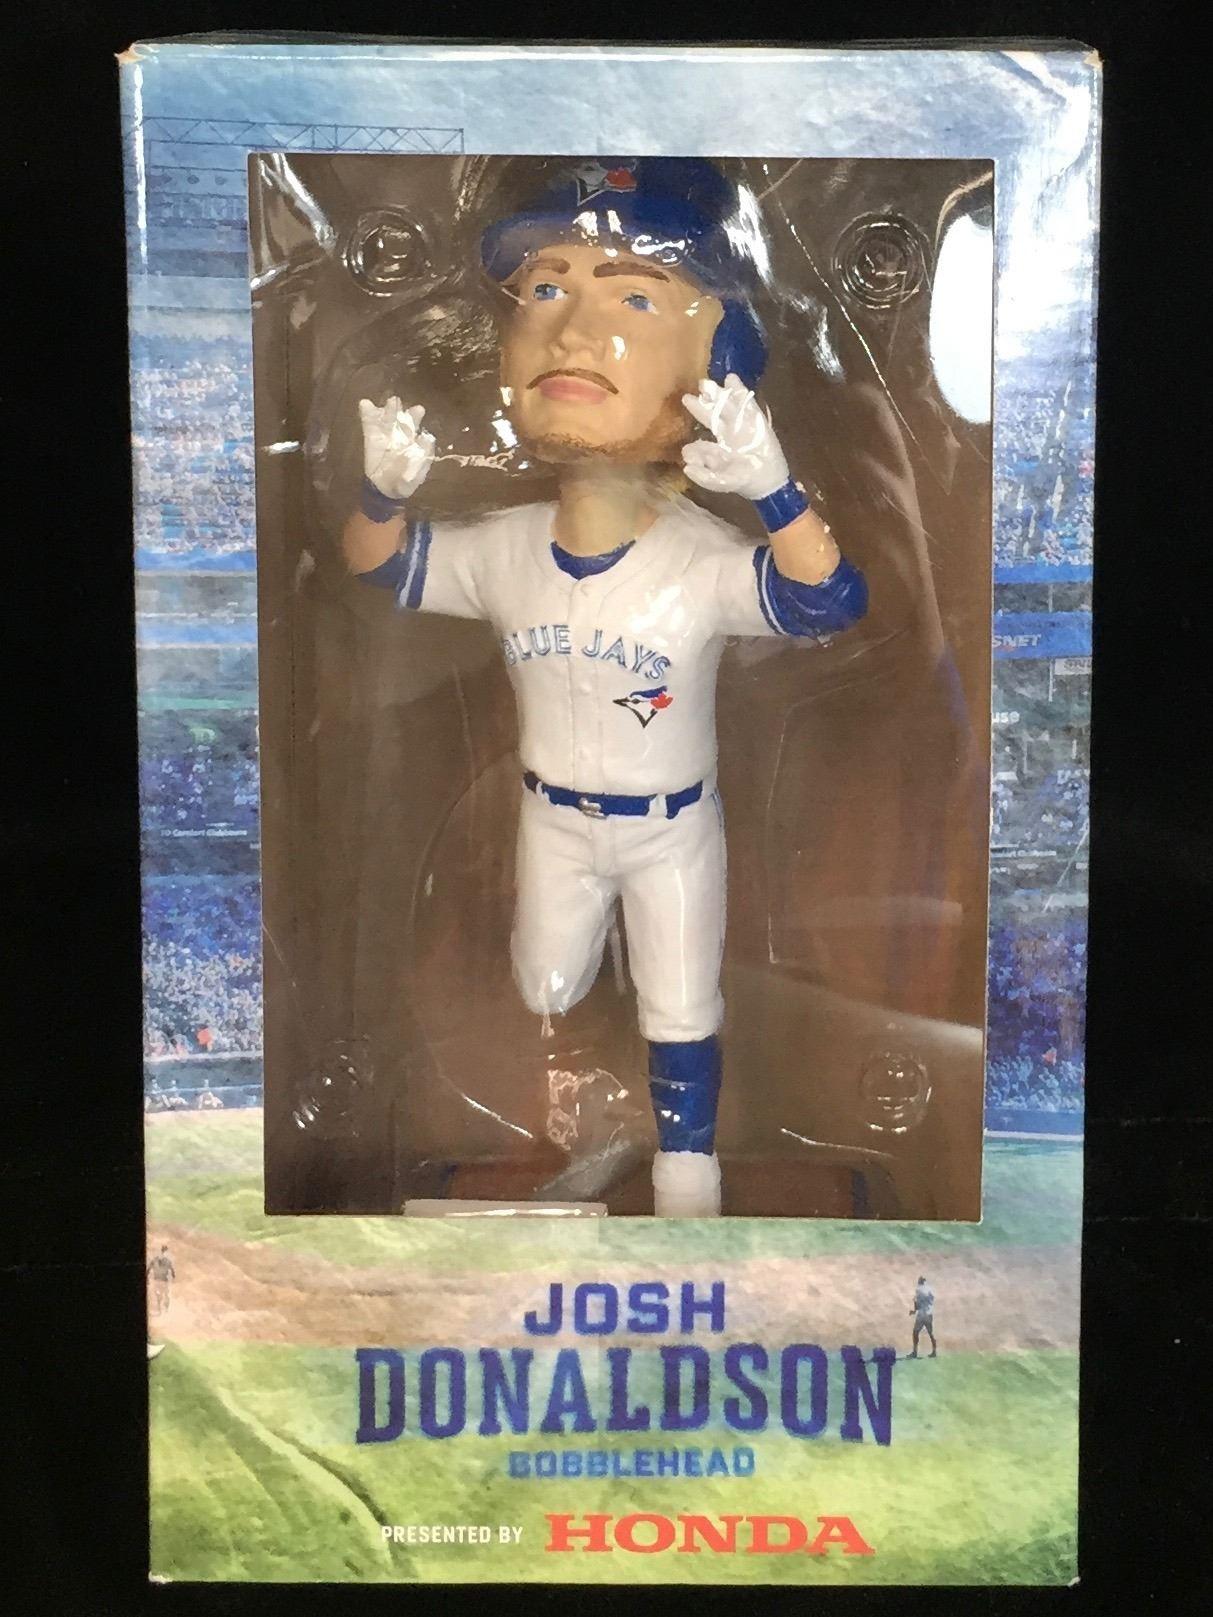 6276c761 Image 1 : JOSH DONALDSON Toronto Blue Jays Bobblehead ...